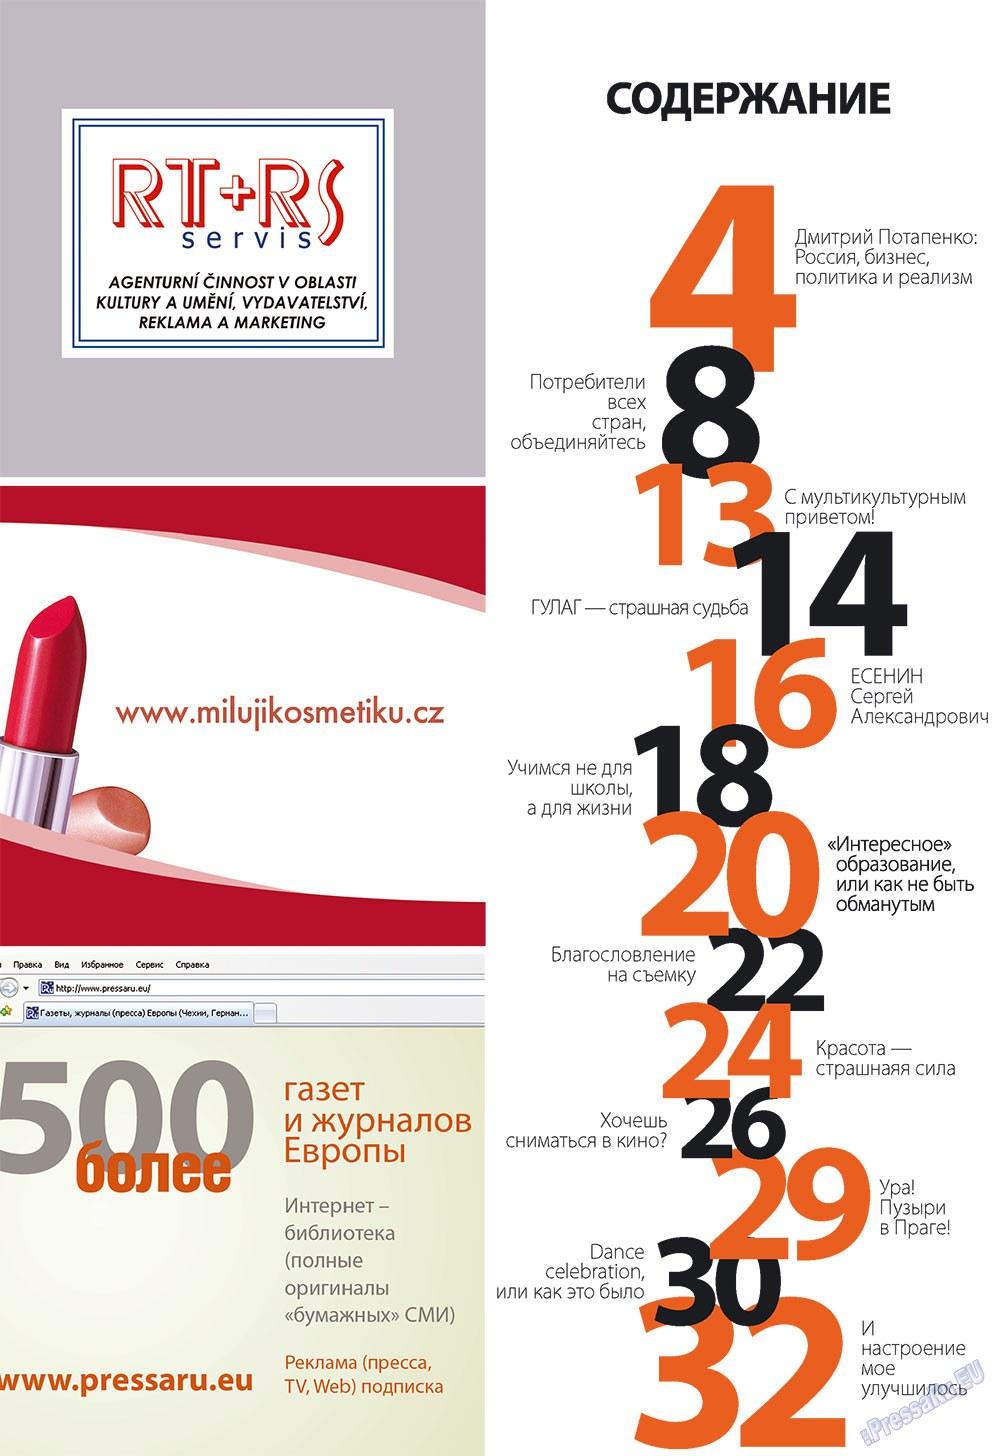 Артек (журнал). 2009 год, номер 4, стр. 3